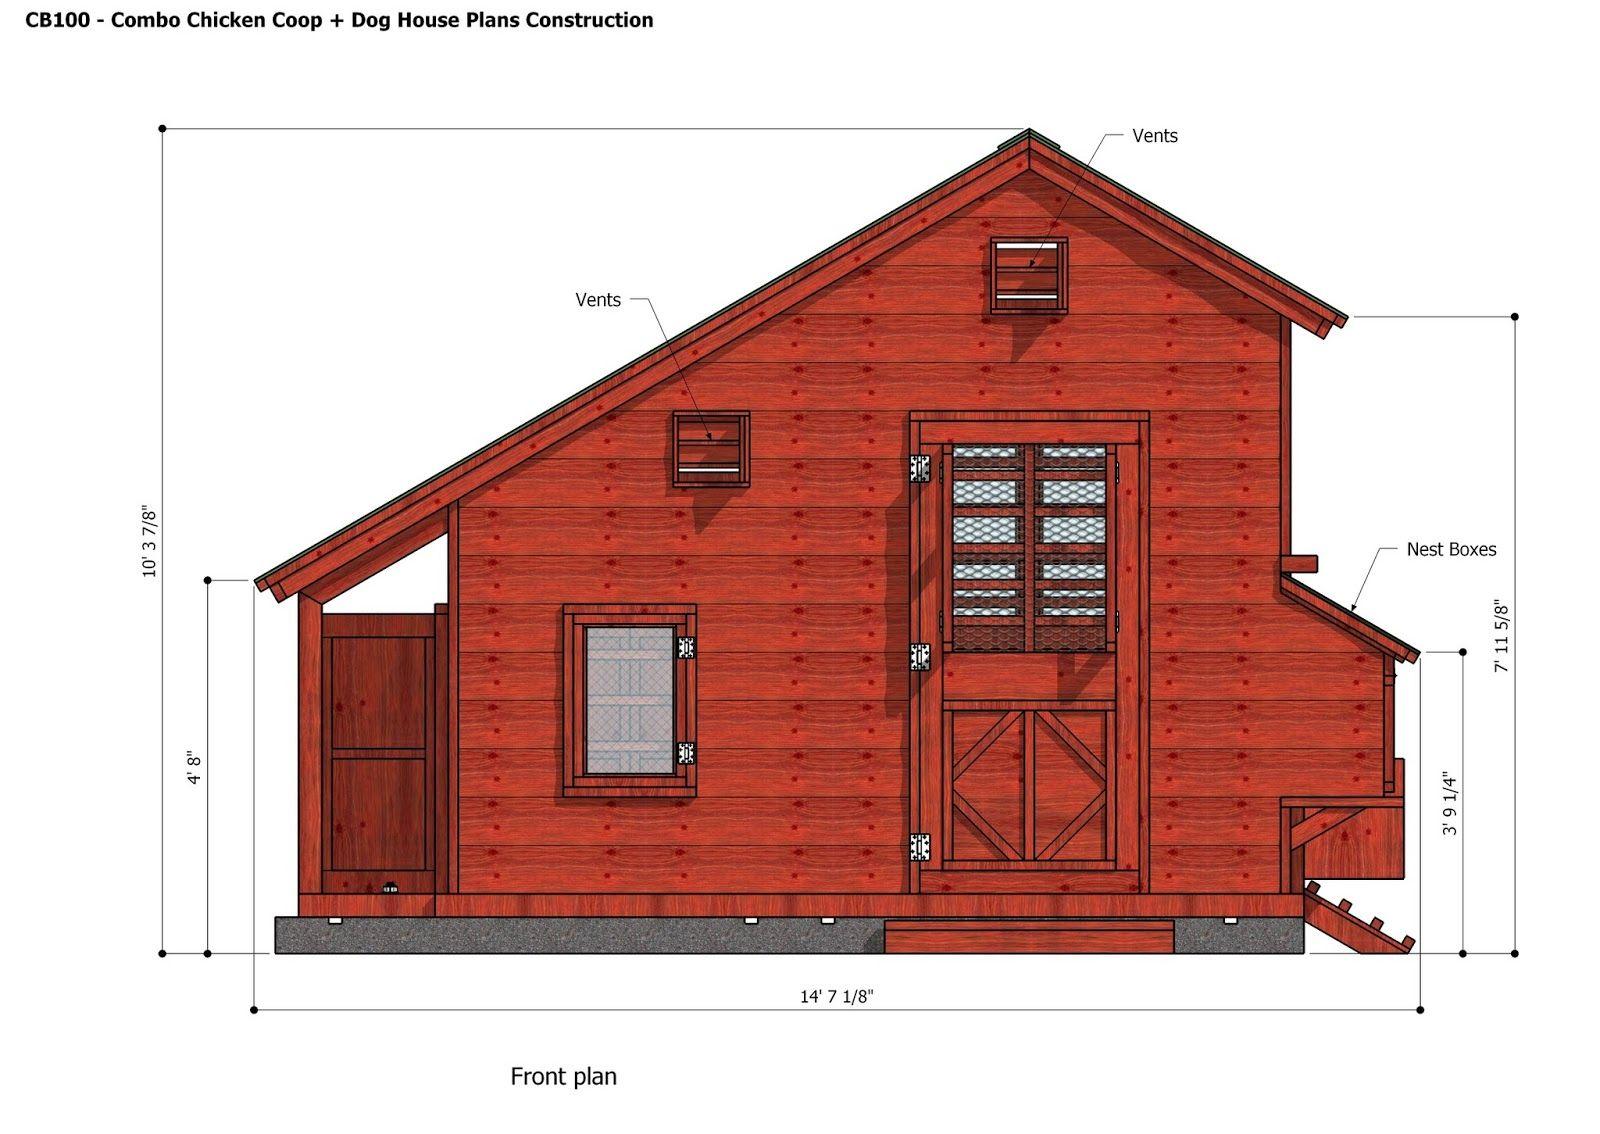 home garden plans: CB100 - Combo Plans - Chicken Coop ...